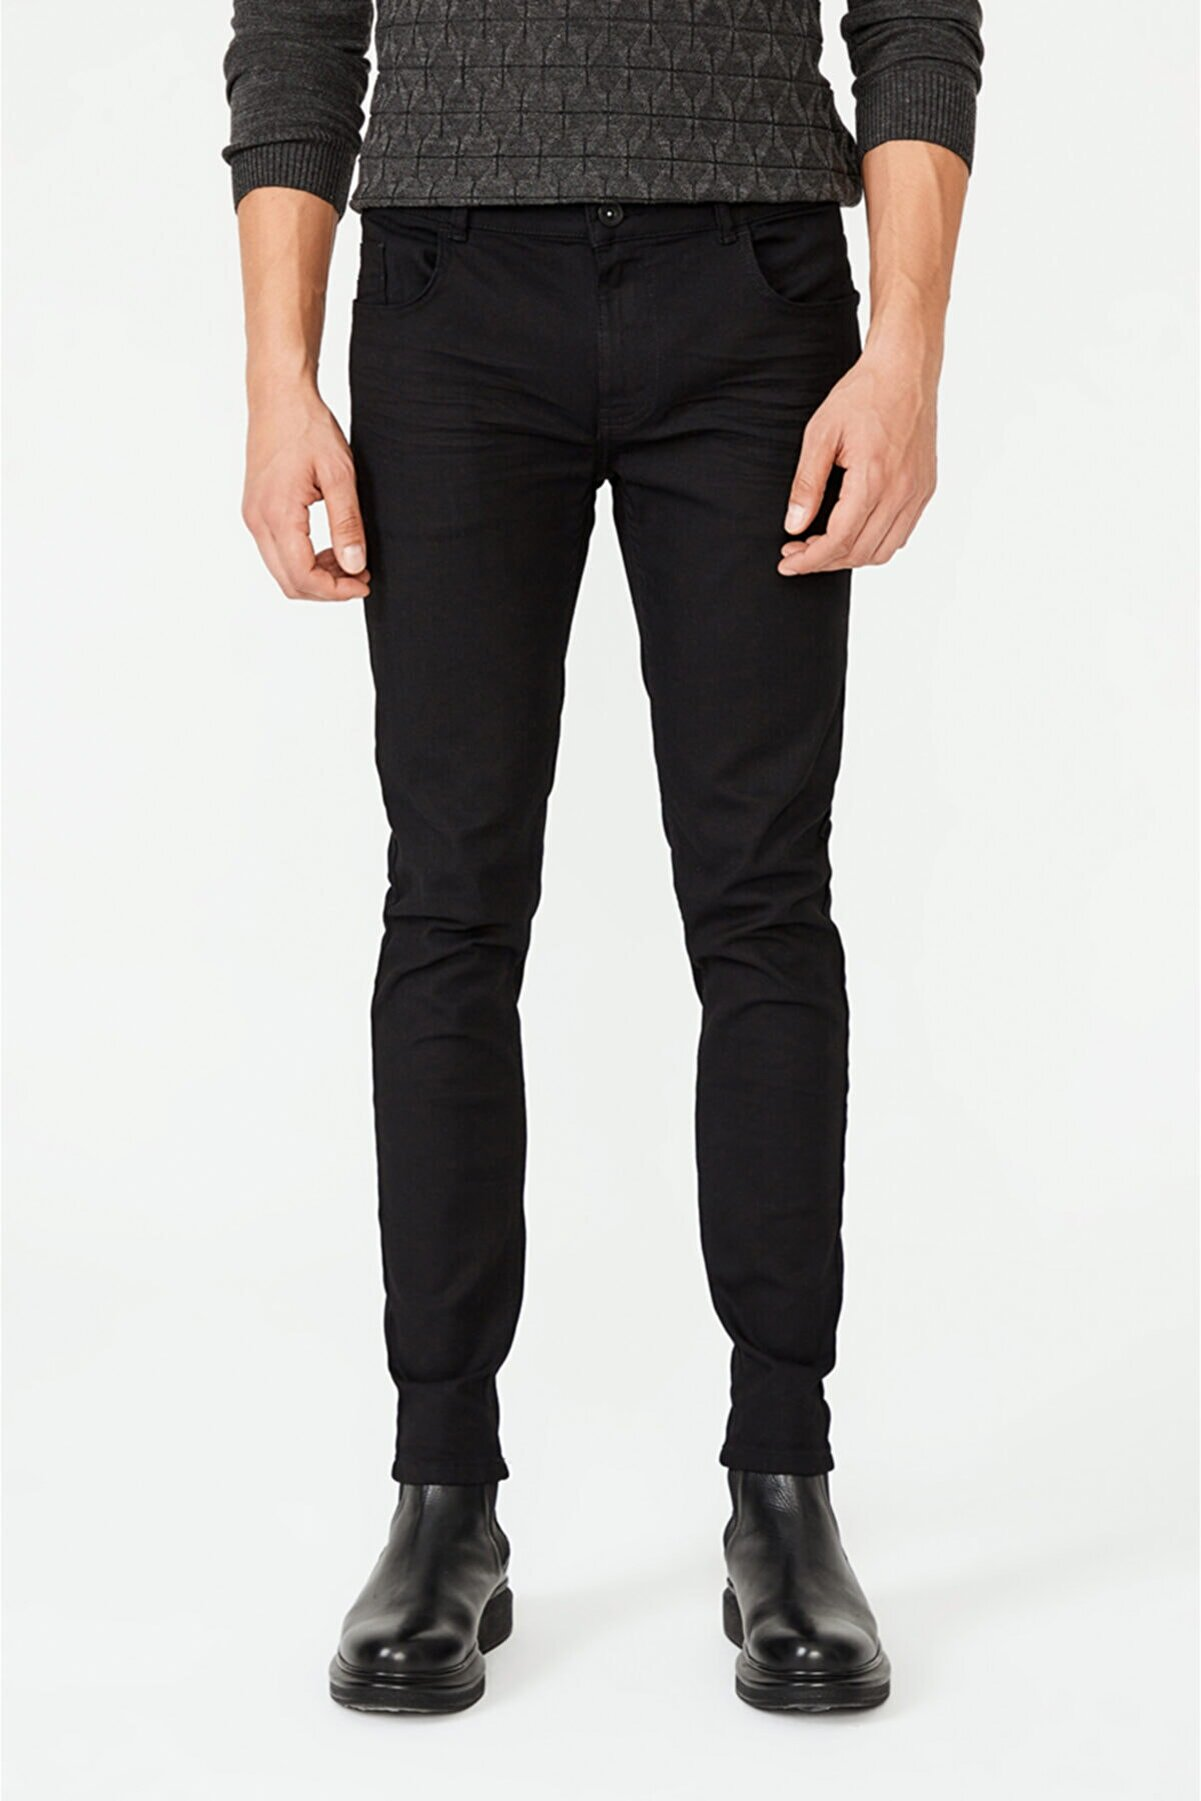 Avva Erkek Siyah Skinny Fit Jean Pantolon A02y3581